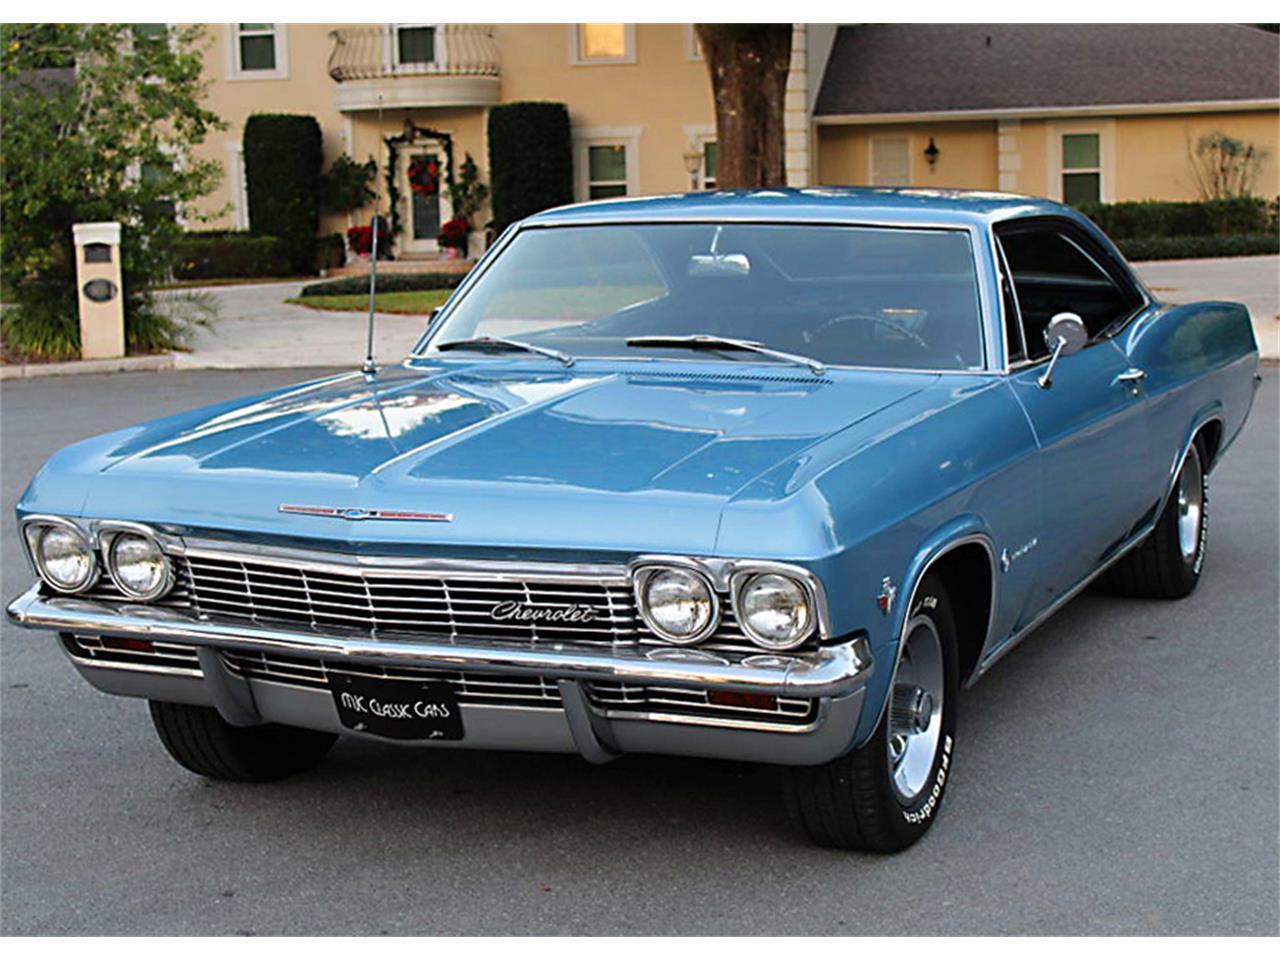 For Sale 1965 Chevrolet Impala In Lakeland Florida